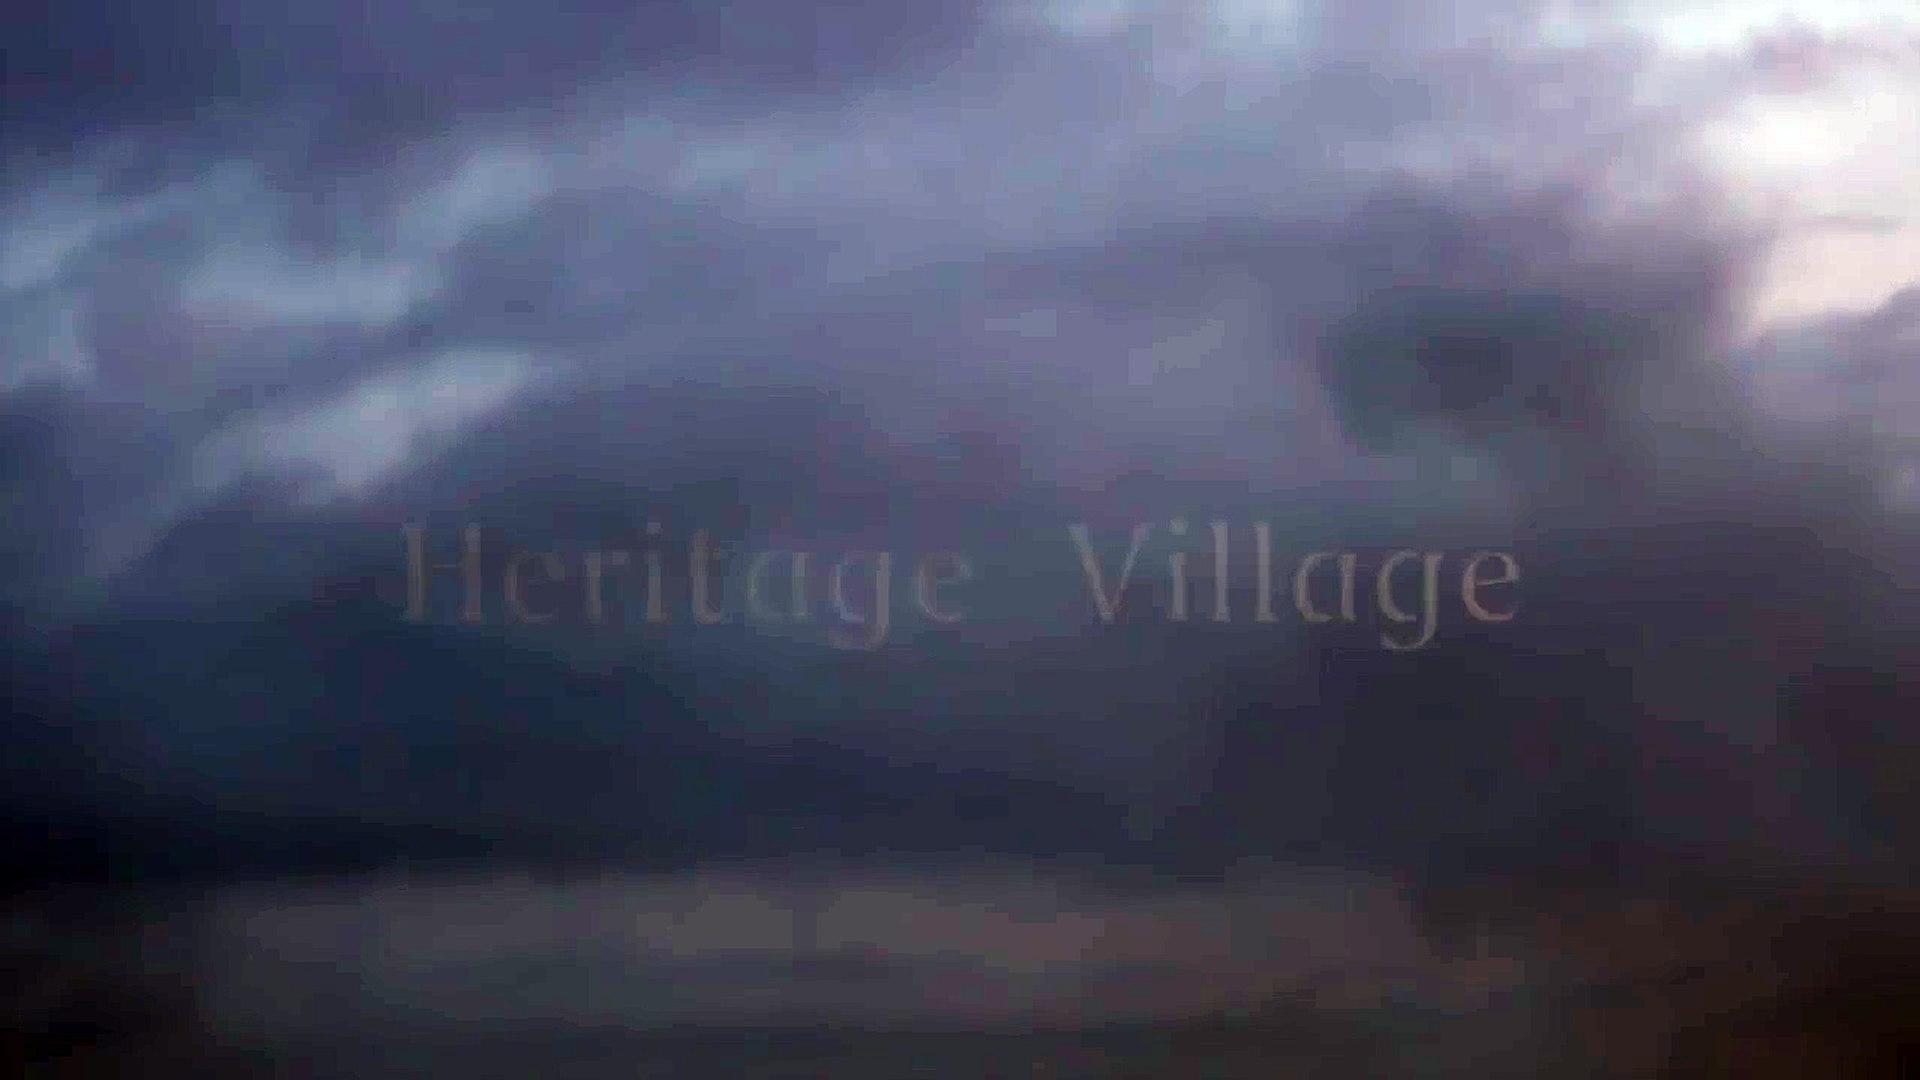 Heritage Village,